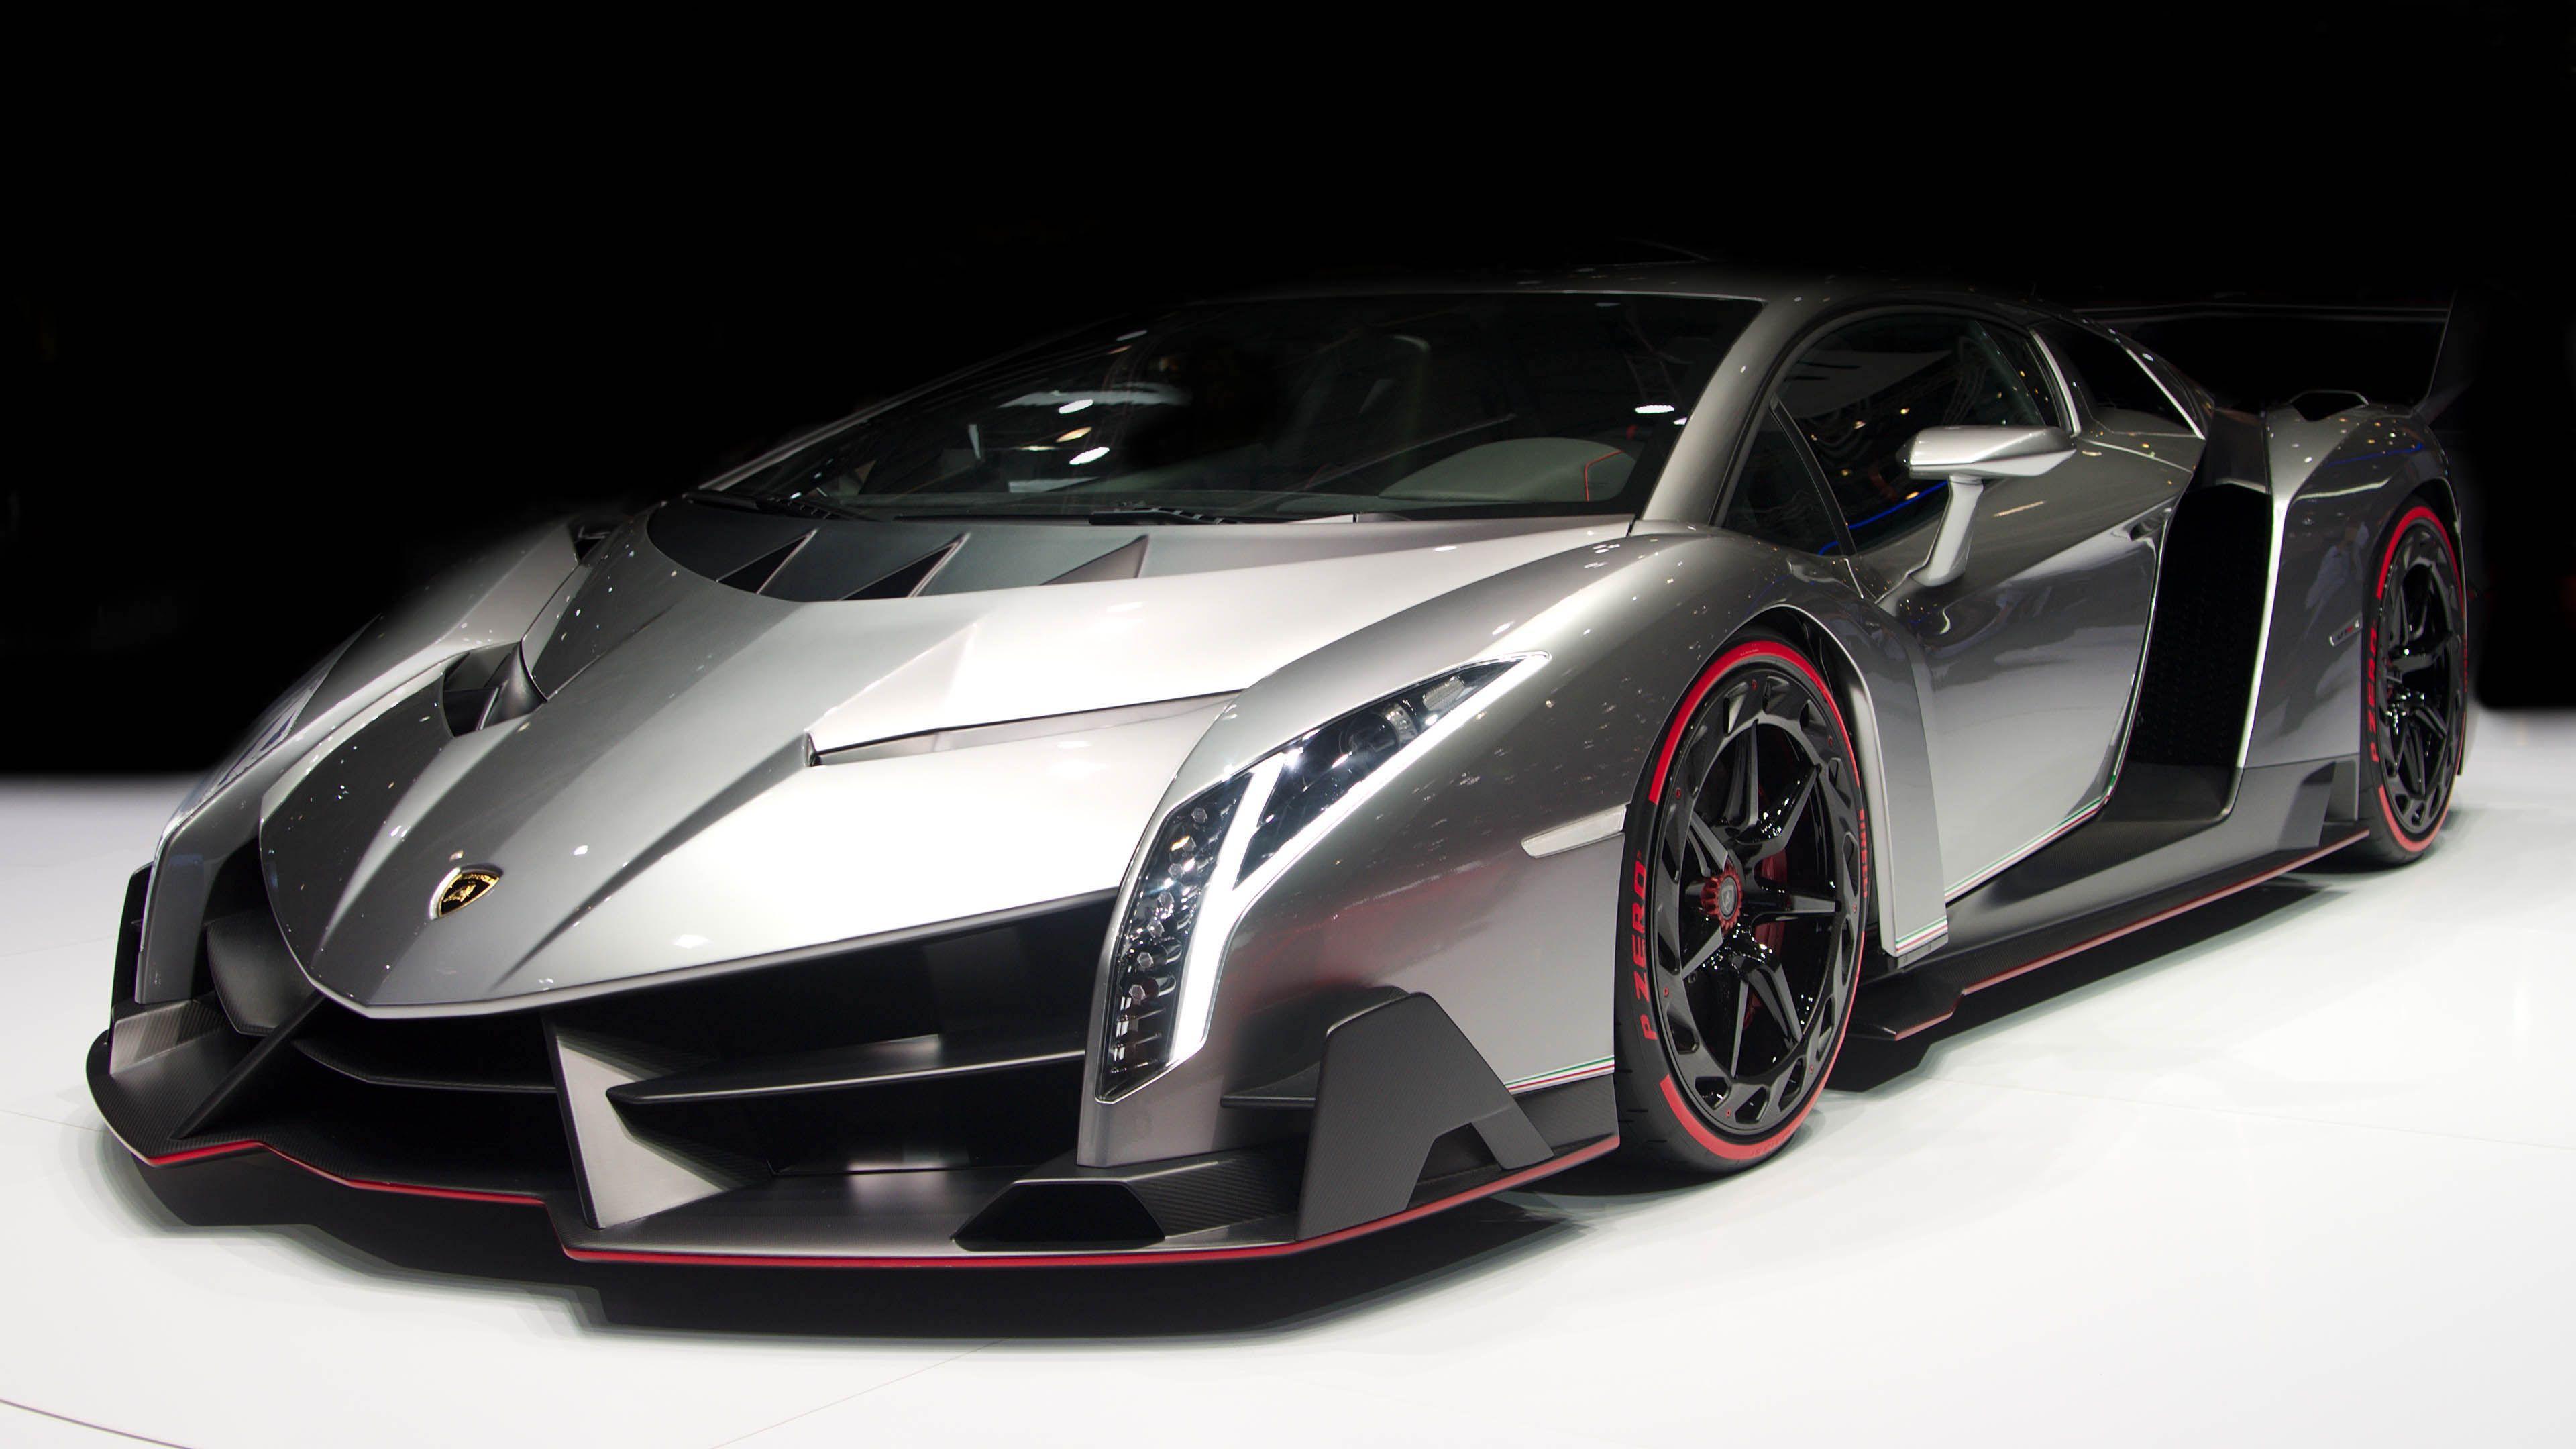 Lamborghini Veneno Wallpapers Top Free Lamborghini Veneno